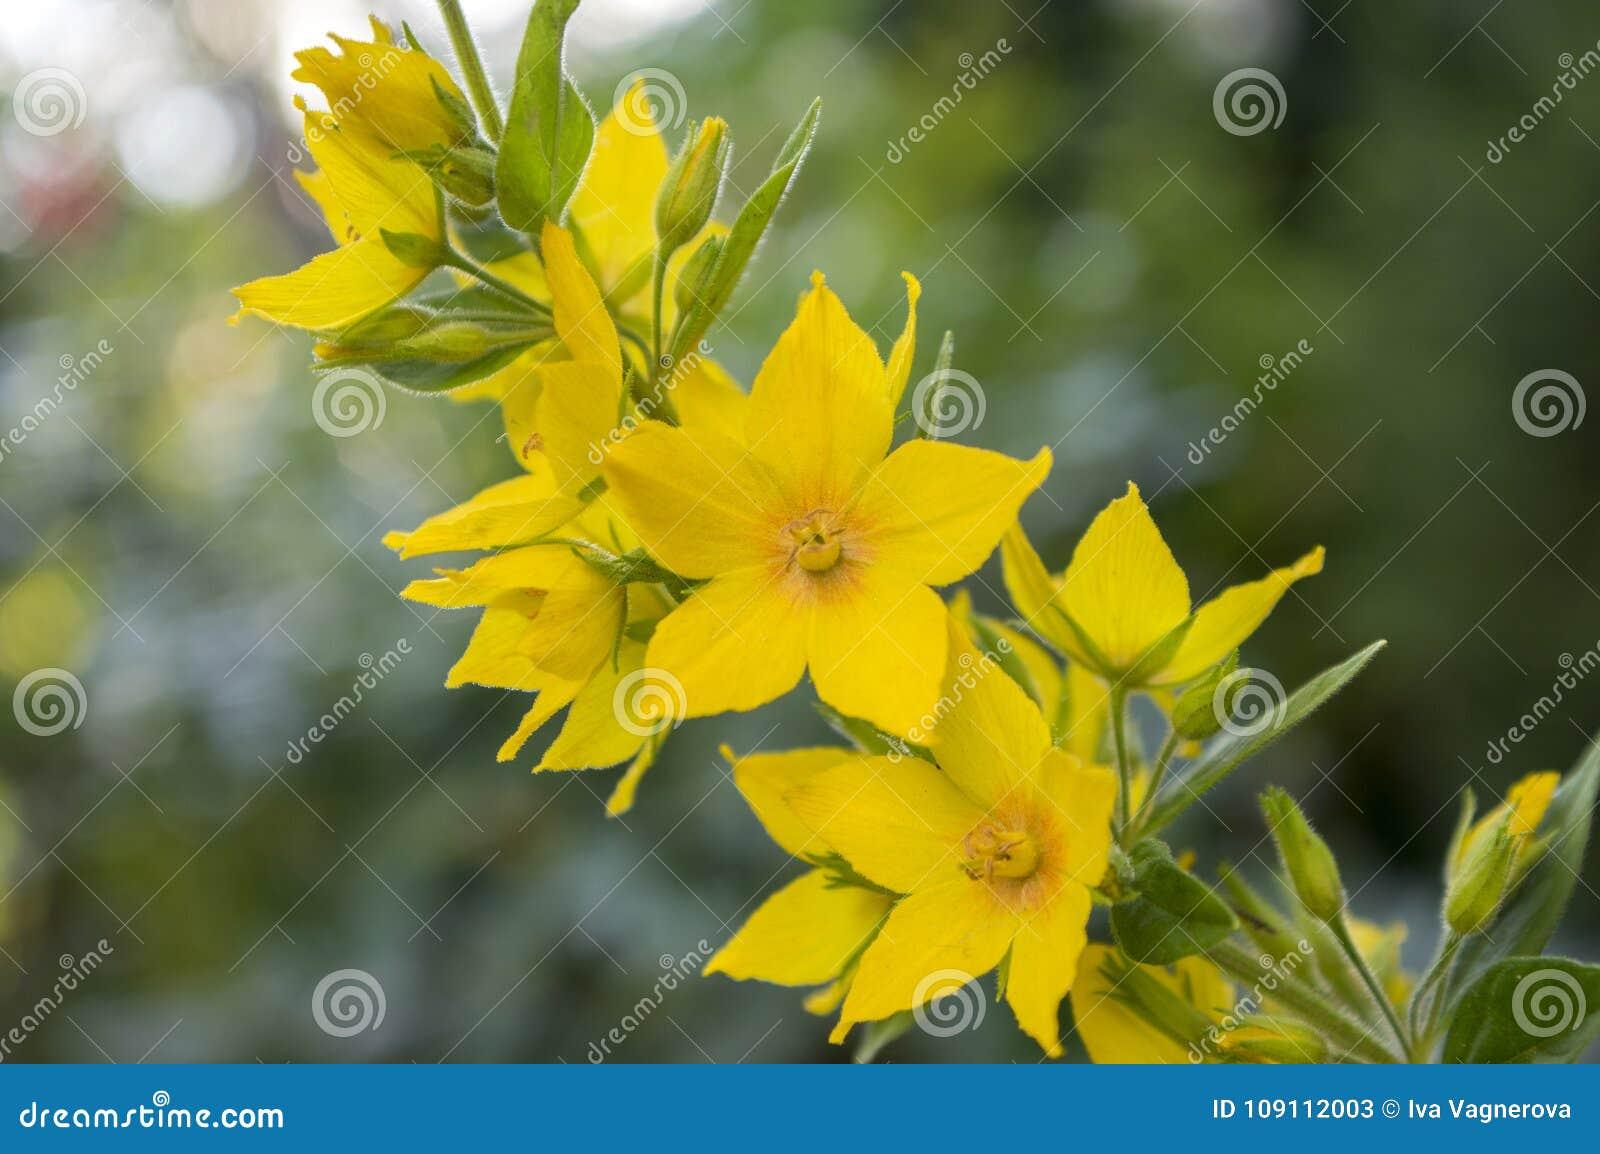 Yellow lysimachia punctata in bloom stock image image of botany download yellow lysimachia punctata in bloom stock image image of botany outdoors 109112003 mightylinksfo